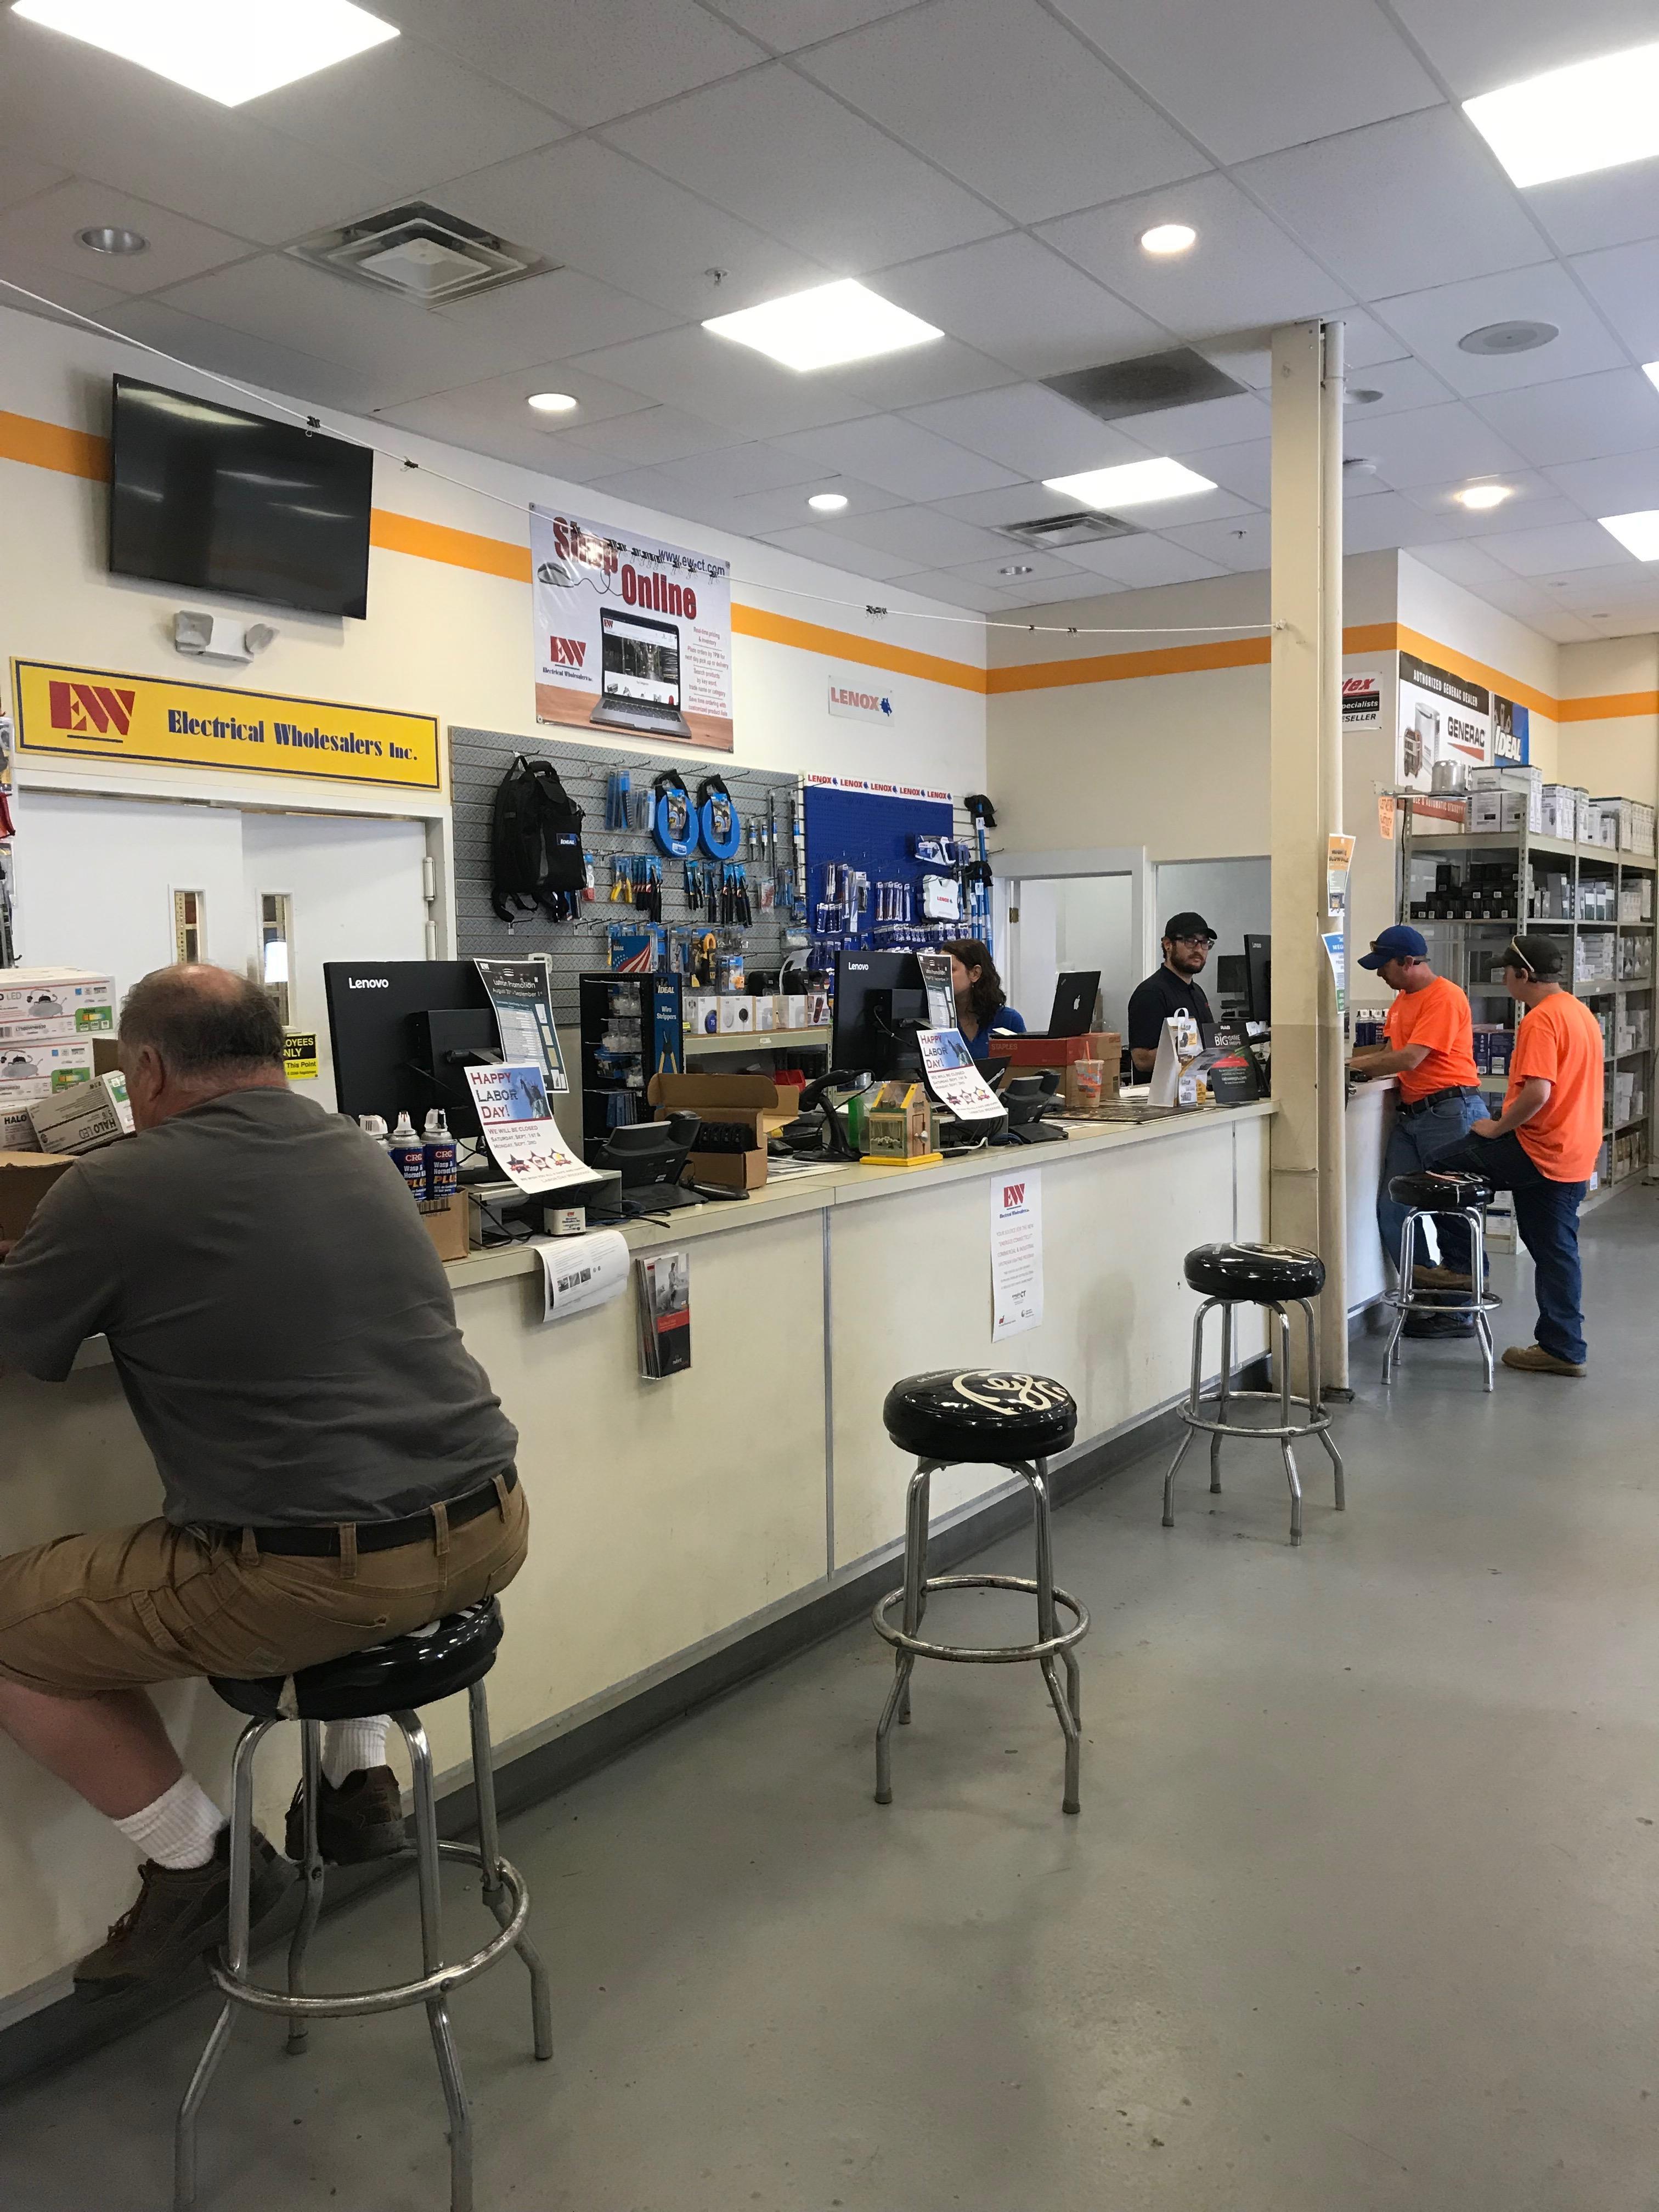 Electrical Wholesalers Inc. image 4